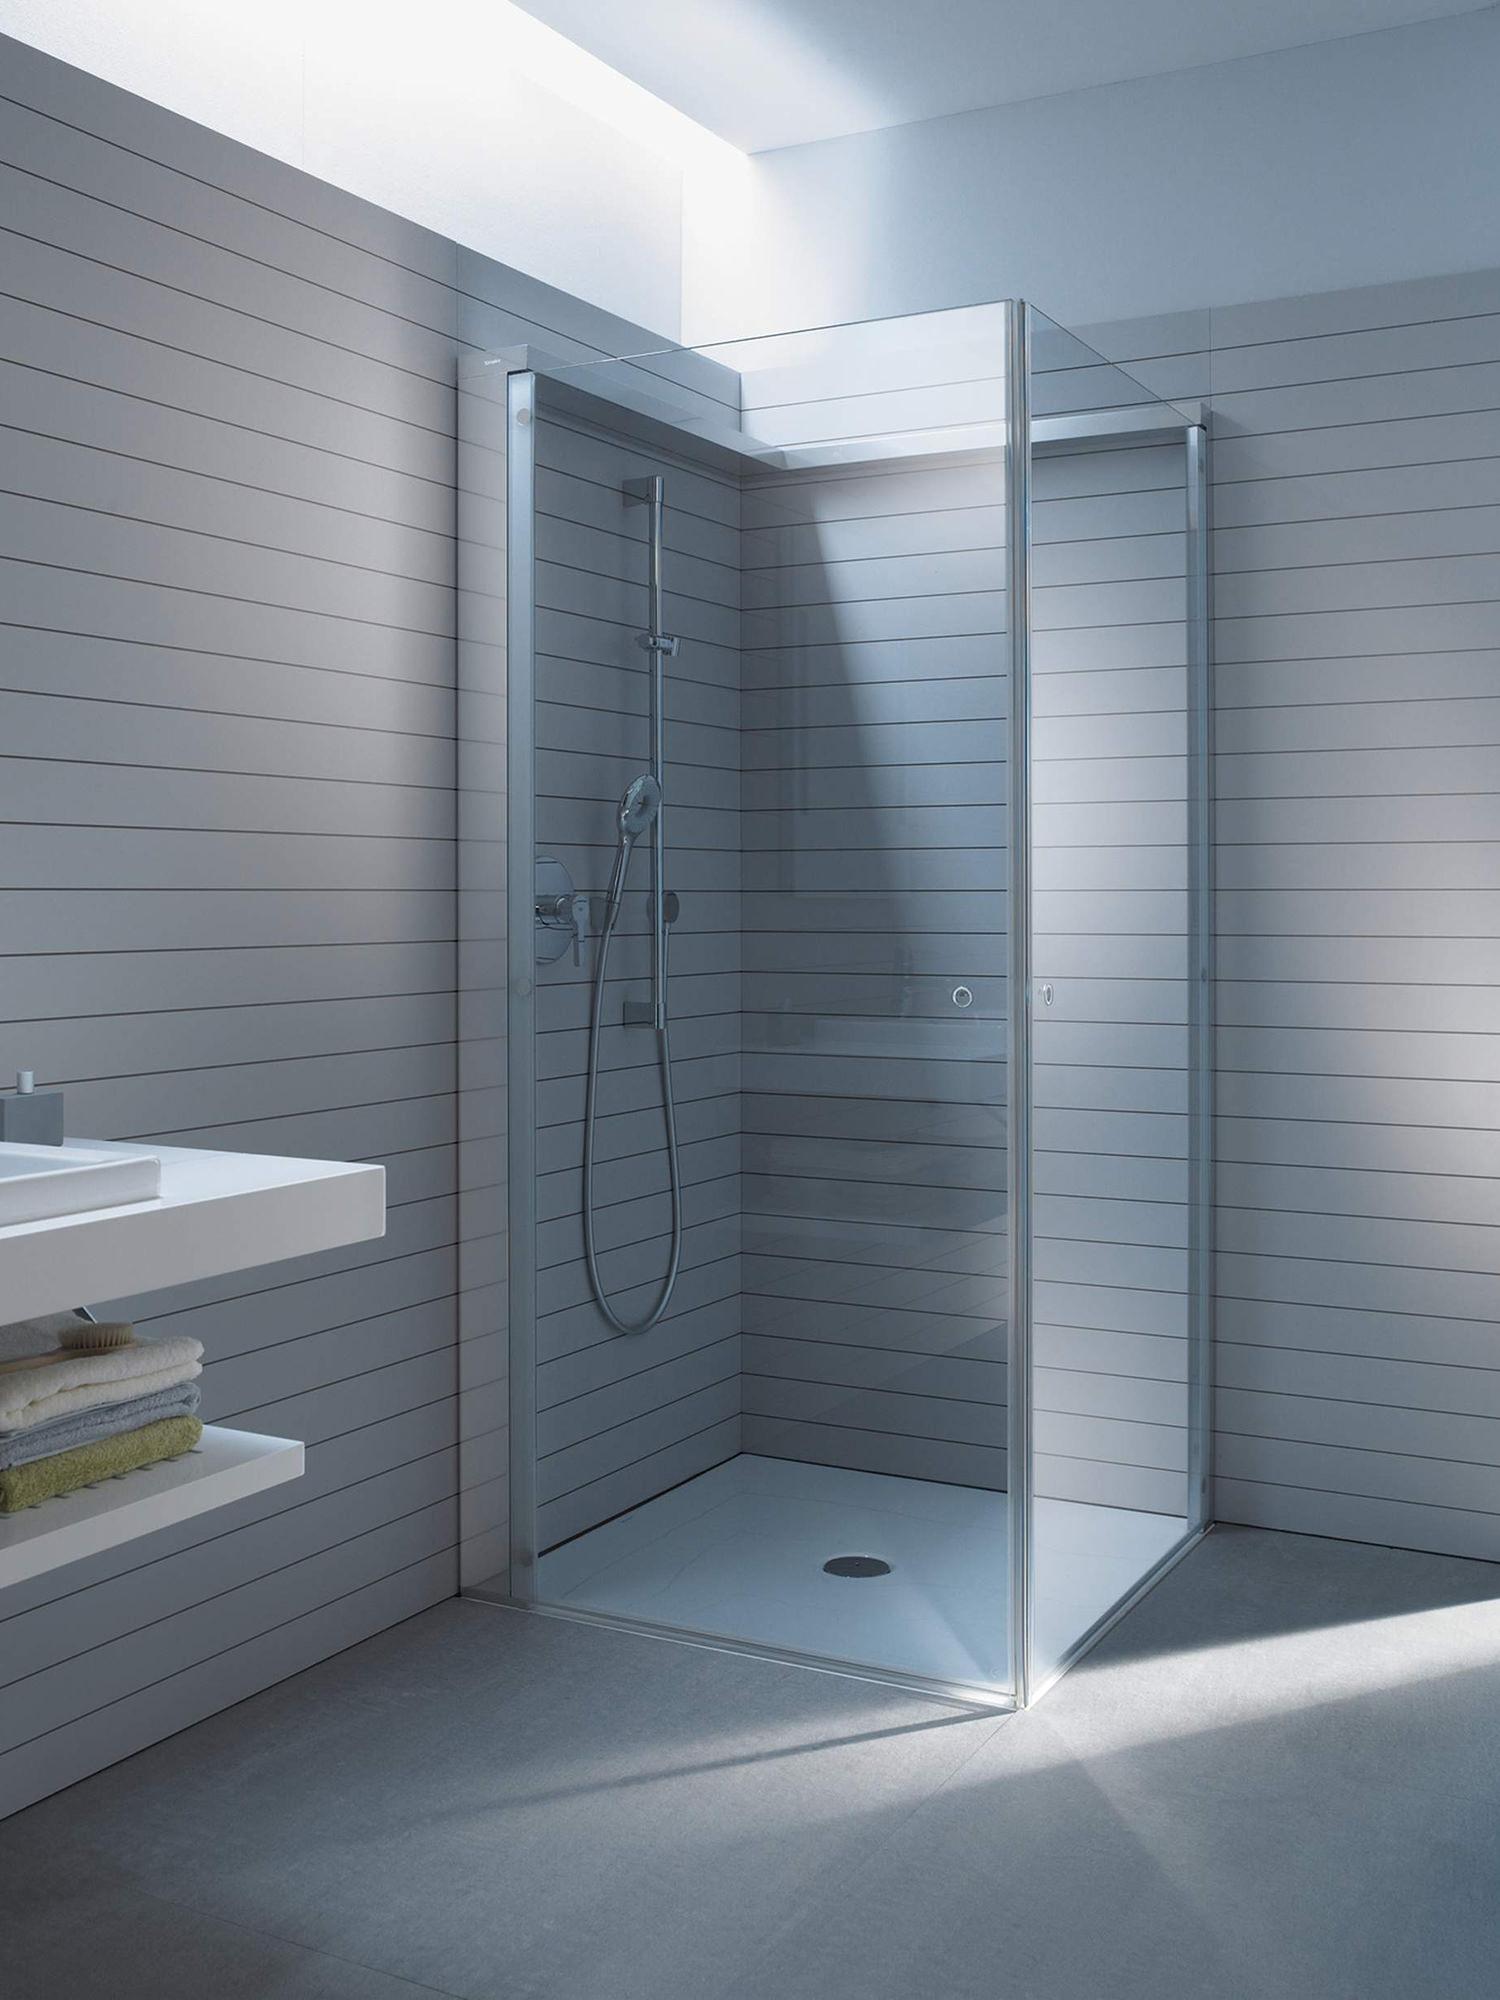 duravit open space shower screen 1000mm shower tray tap. Black Bedroom Furniture Sets. Home Design Ideas